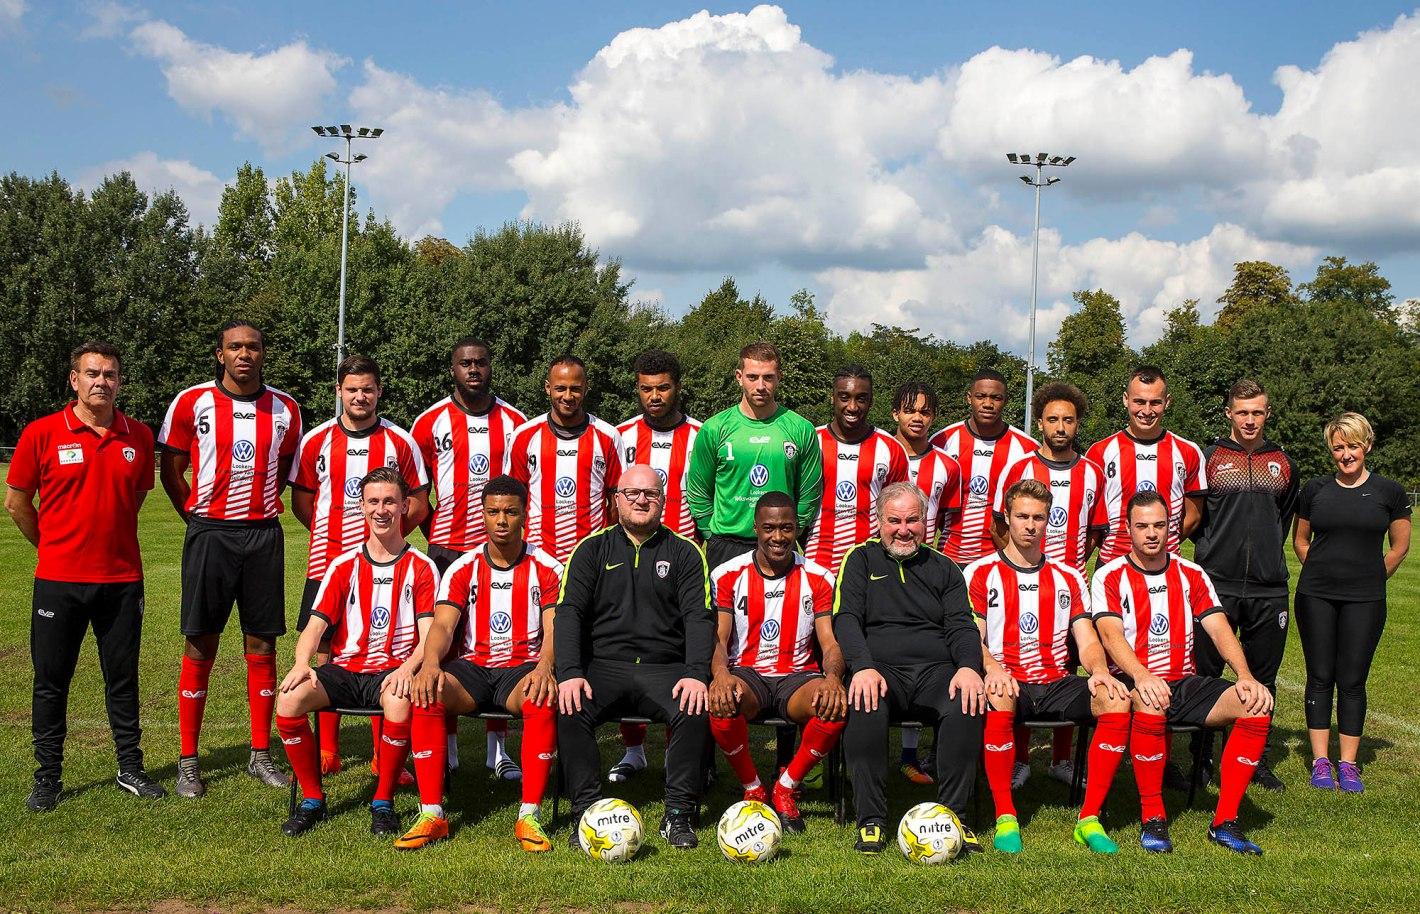 Guildford City FC Squad 2017/2018